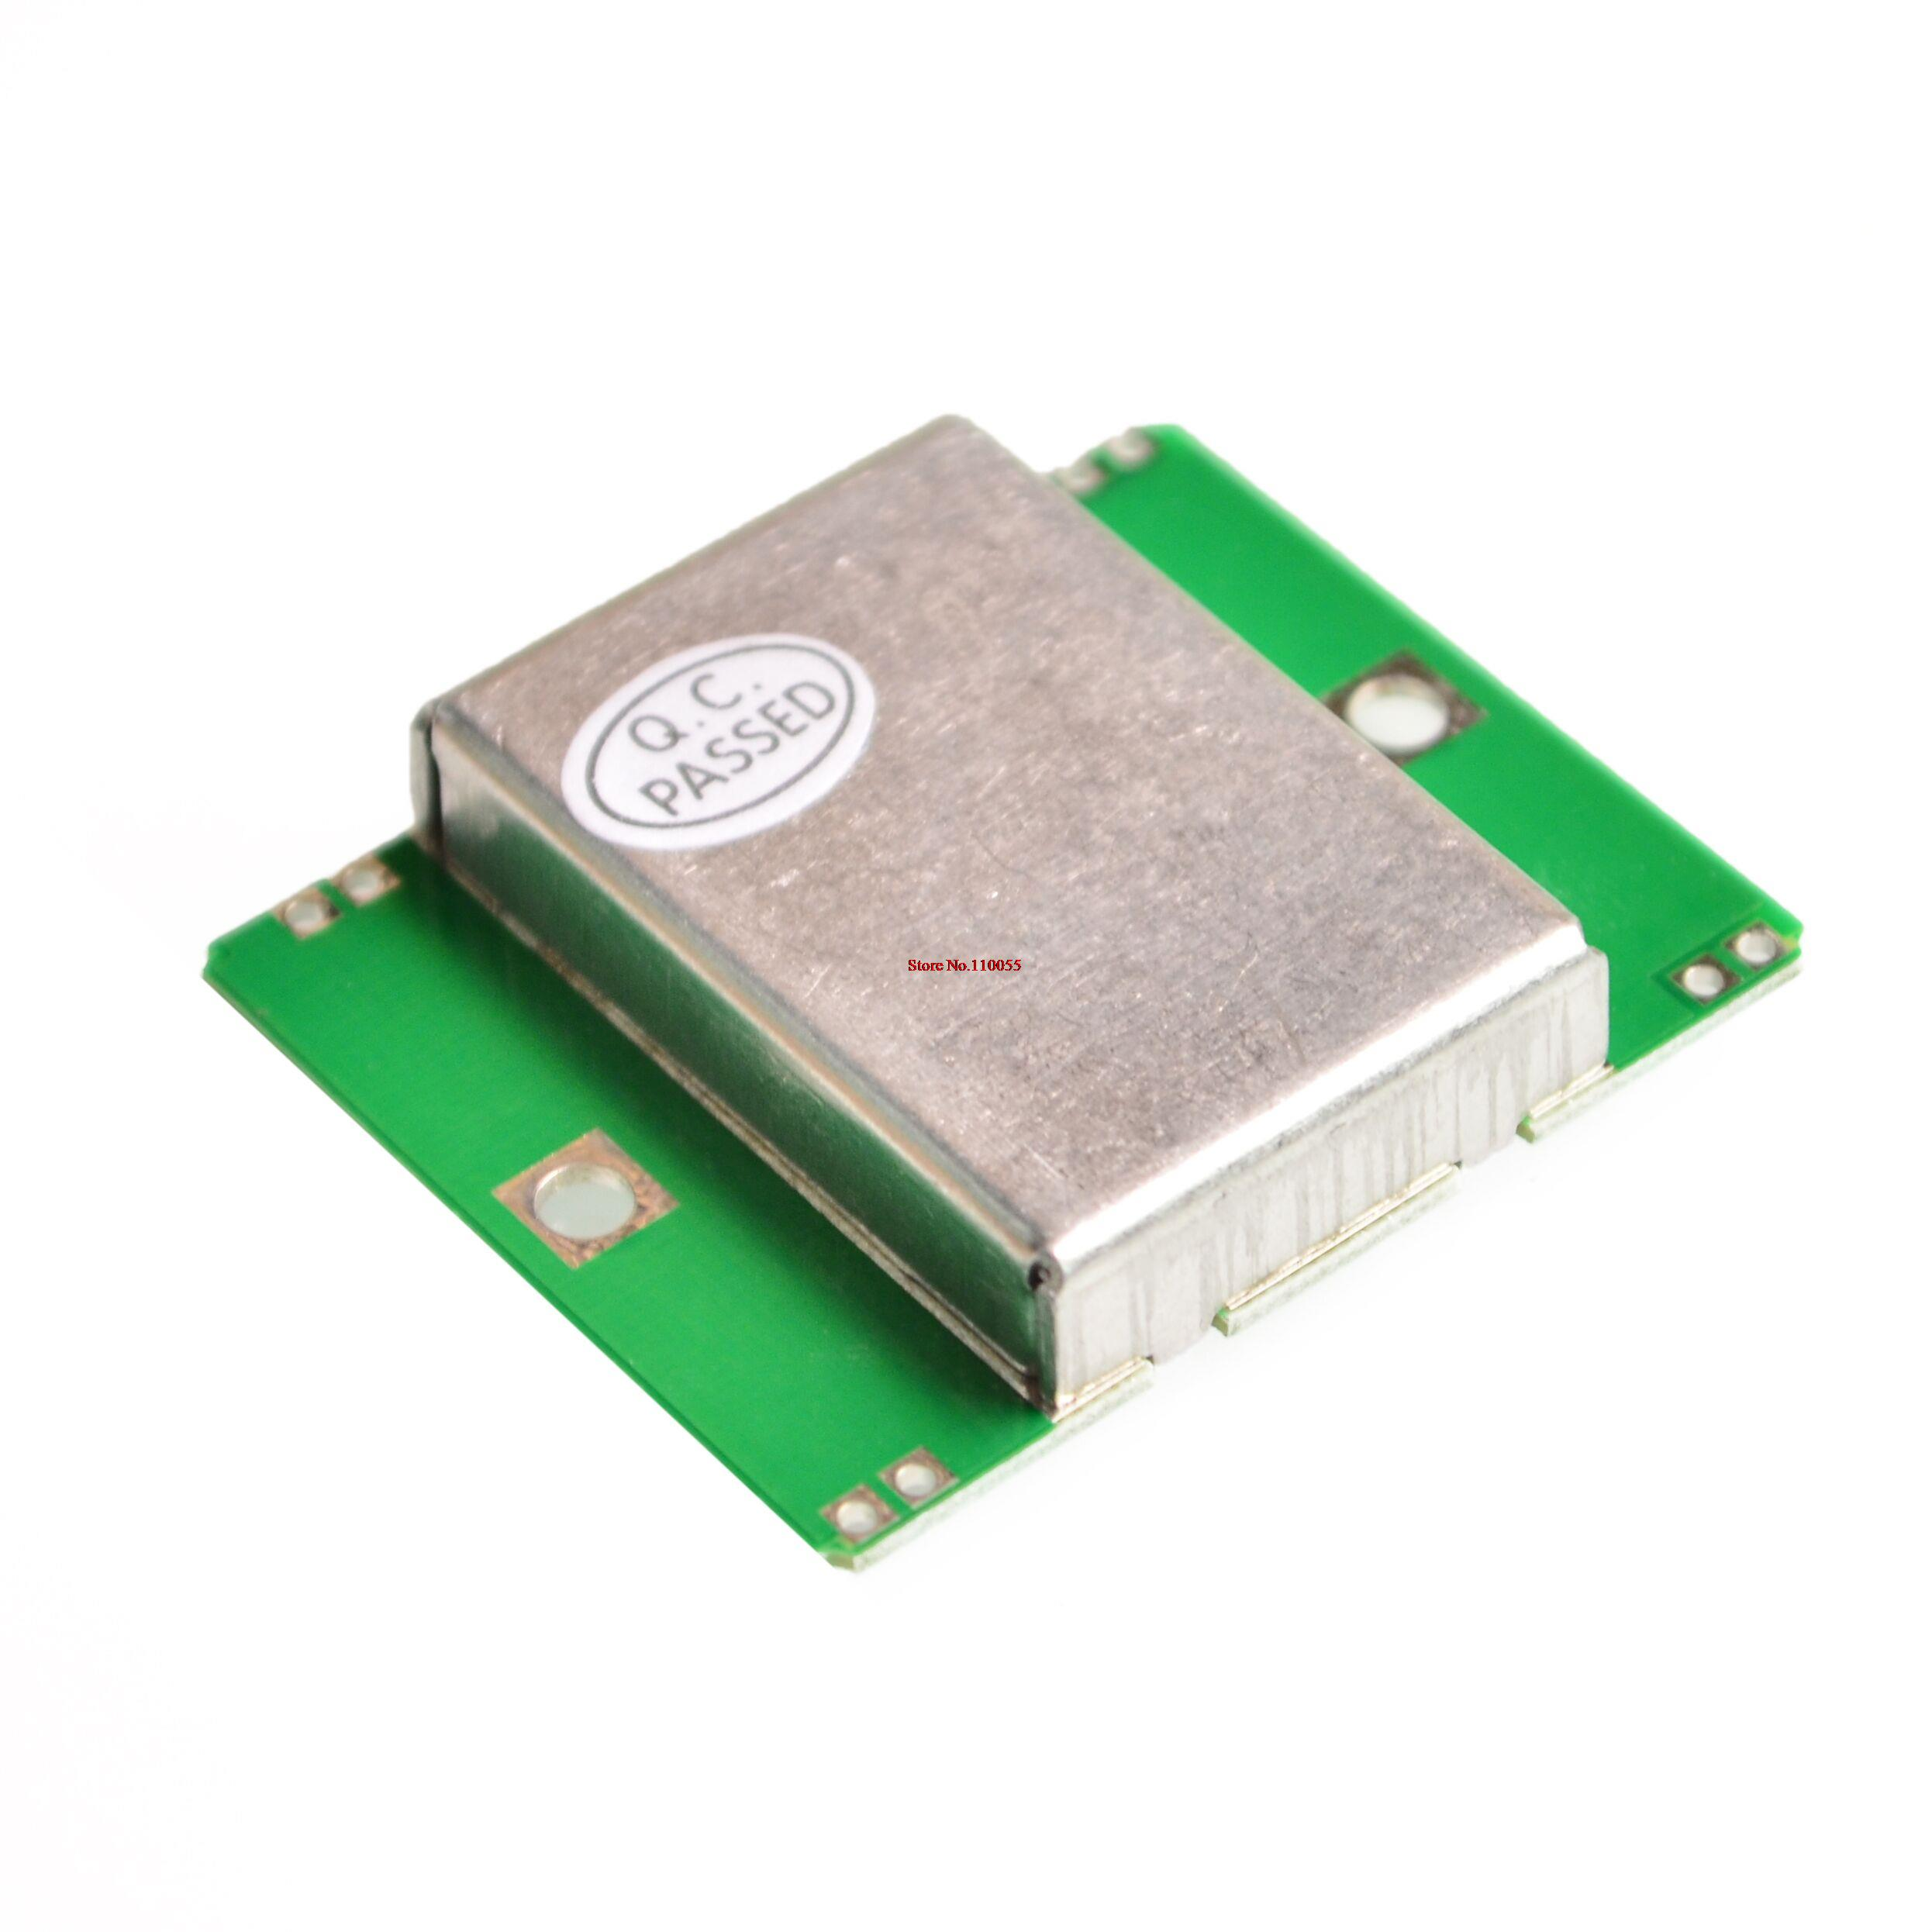 Hb100 Microwave Doppler Radar Wireless Module Motion